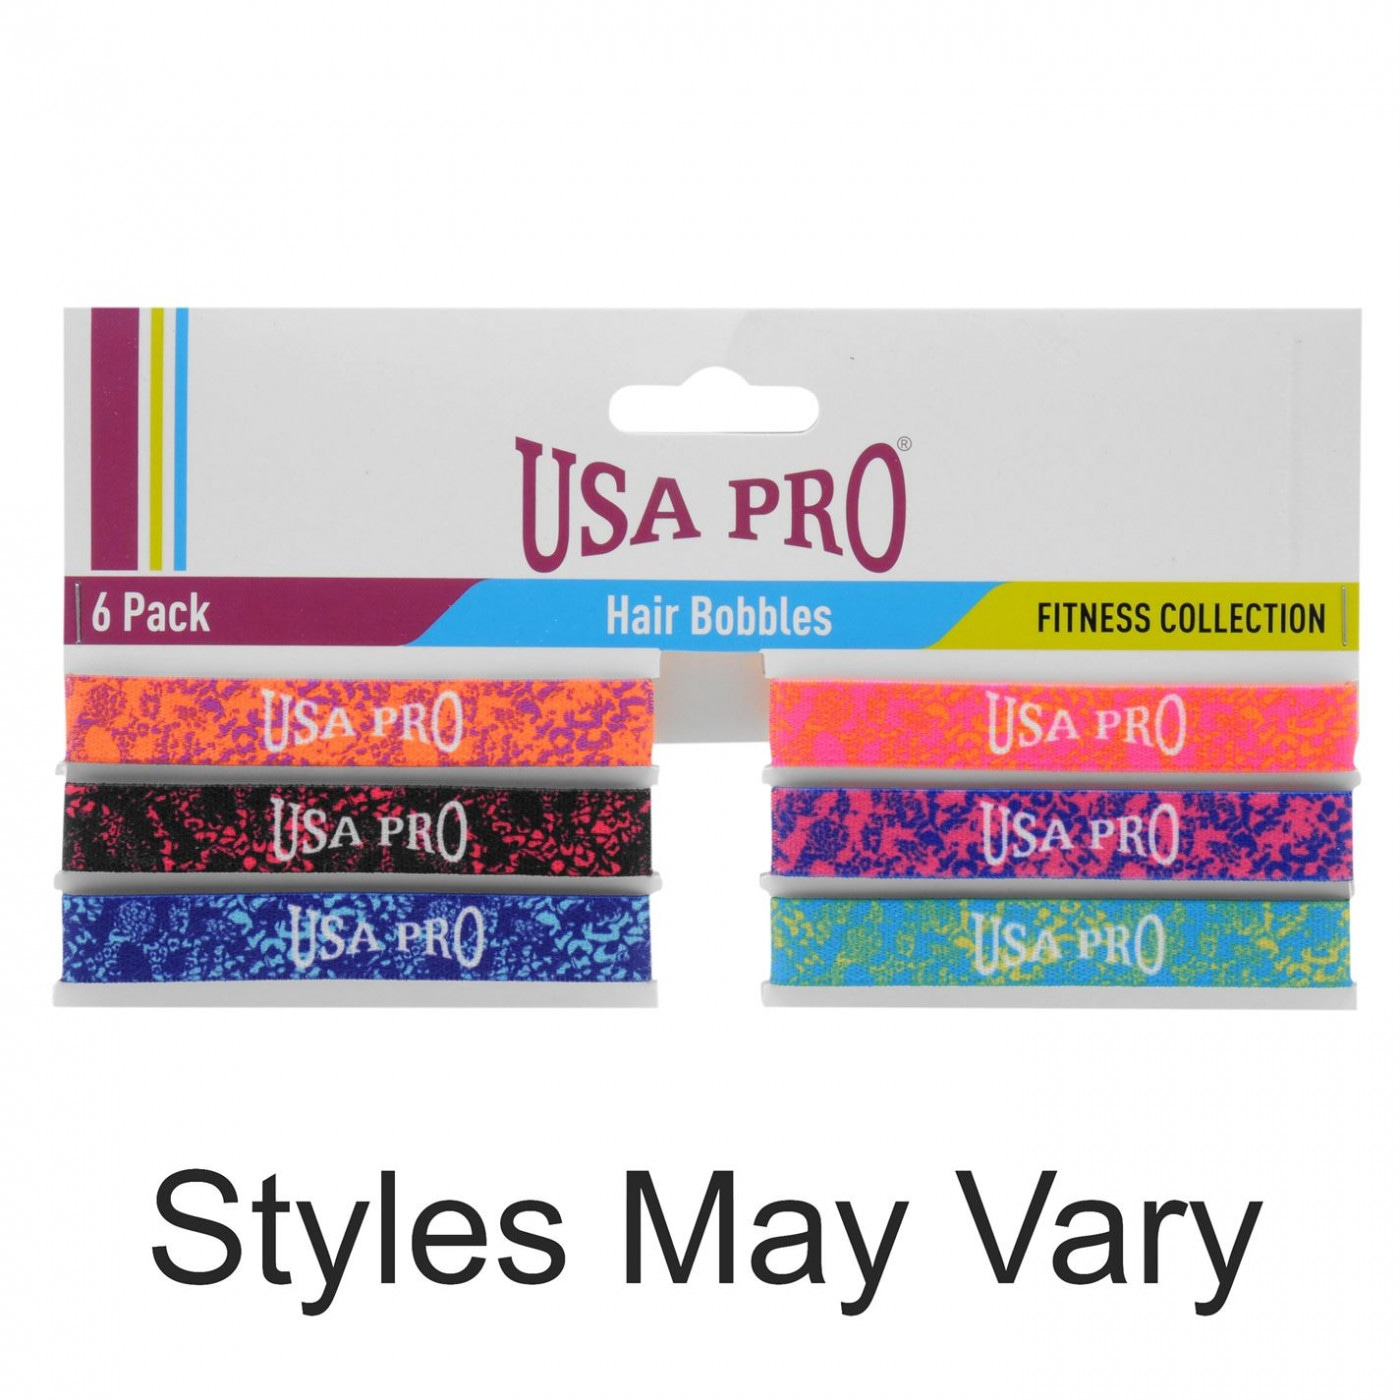 USA Pro Hair Bobbles